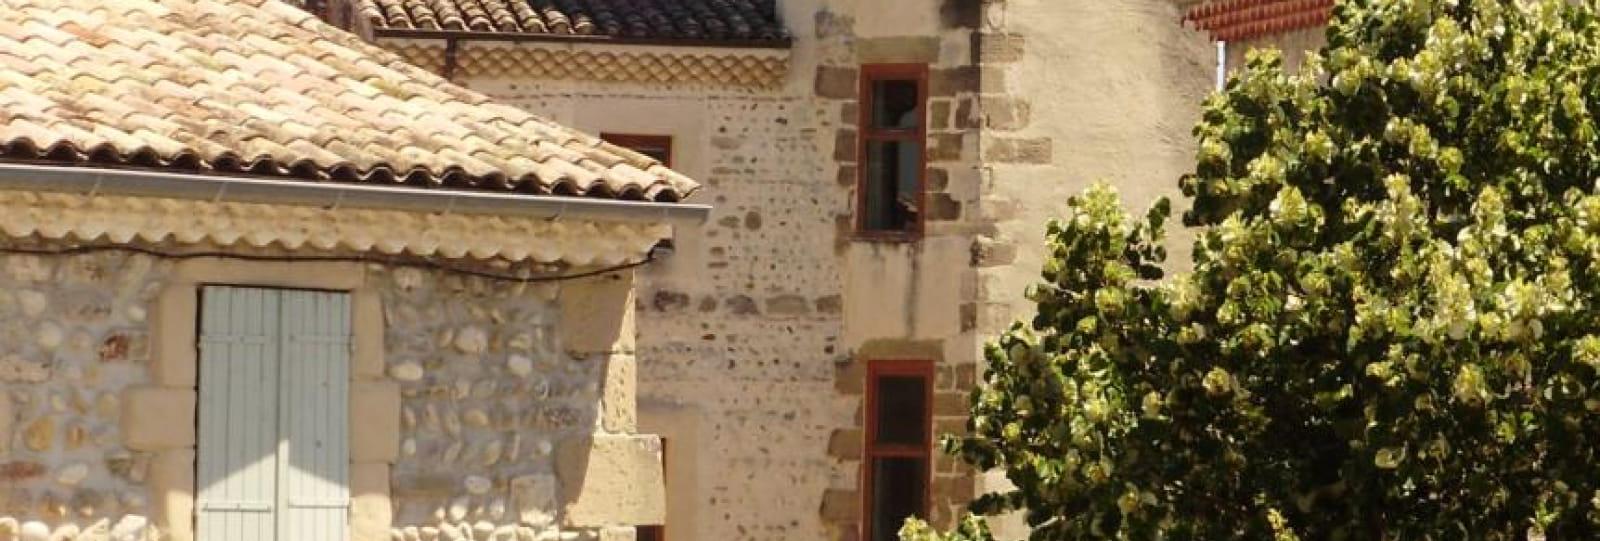 Turm Diane de Poitiers - Bücherei